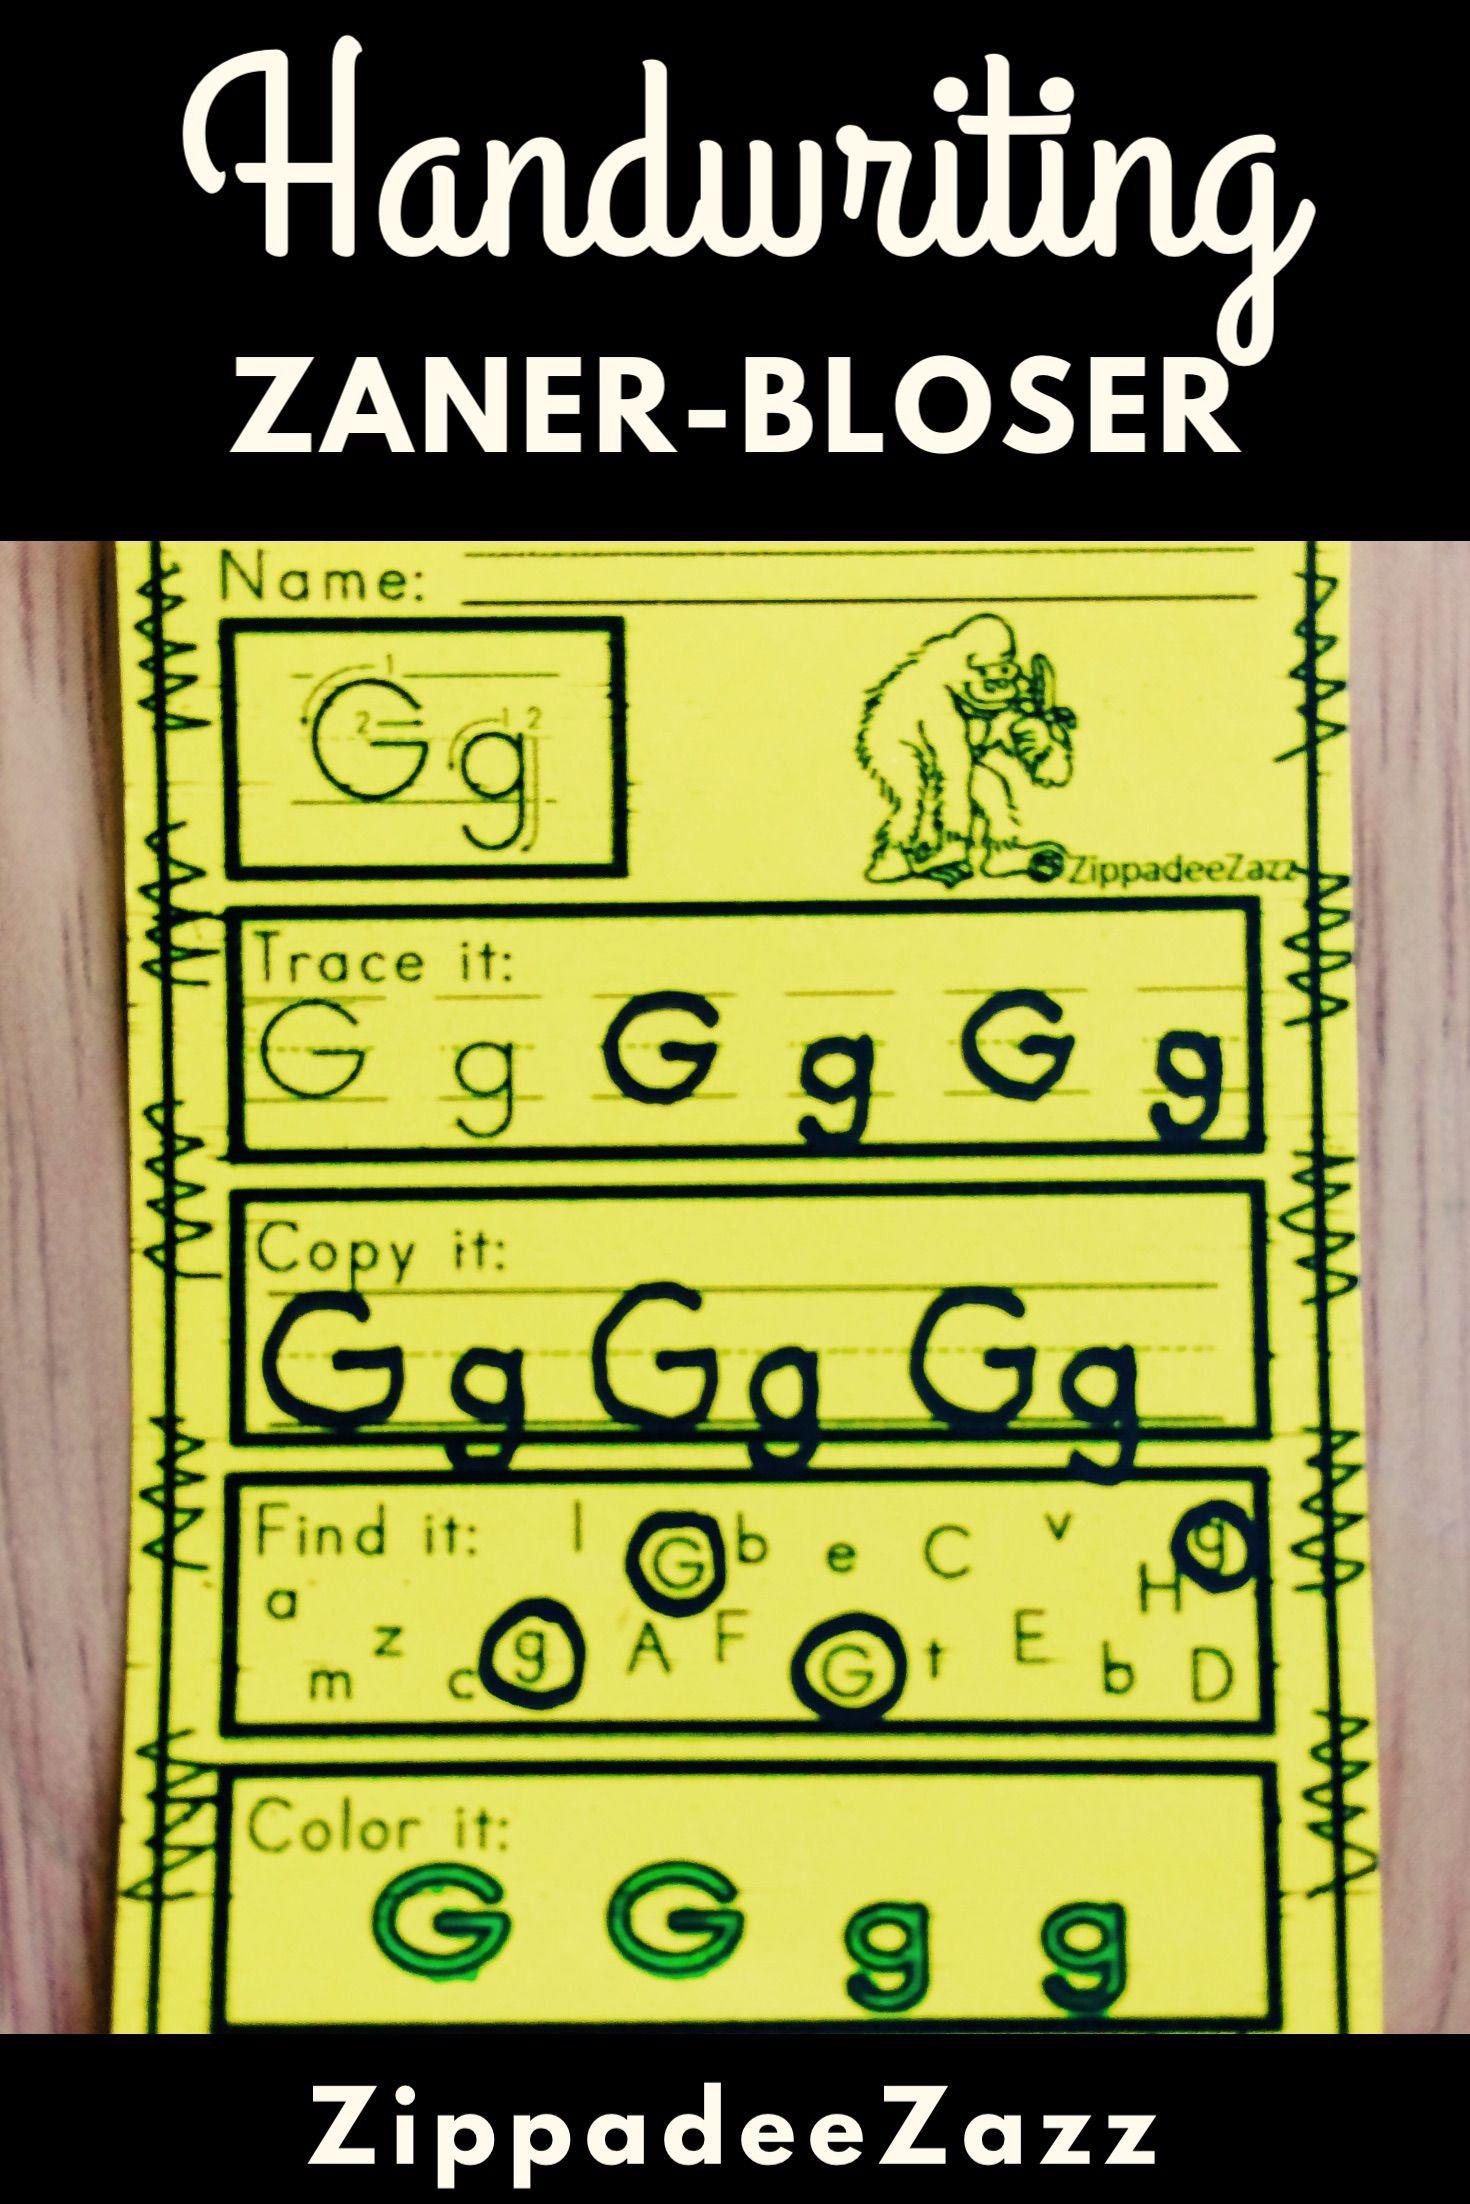 worksheet Zaner Bloser Handwriting Worksheets worksheets for zaner bloser handwriting practice practice